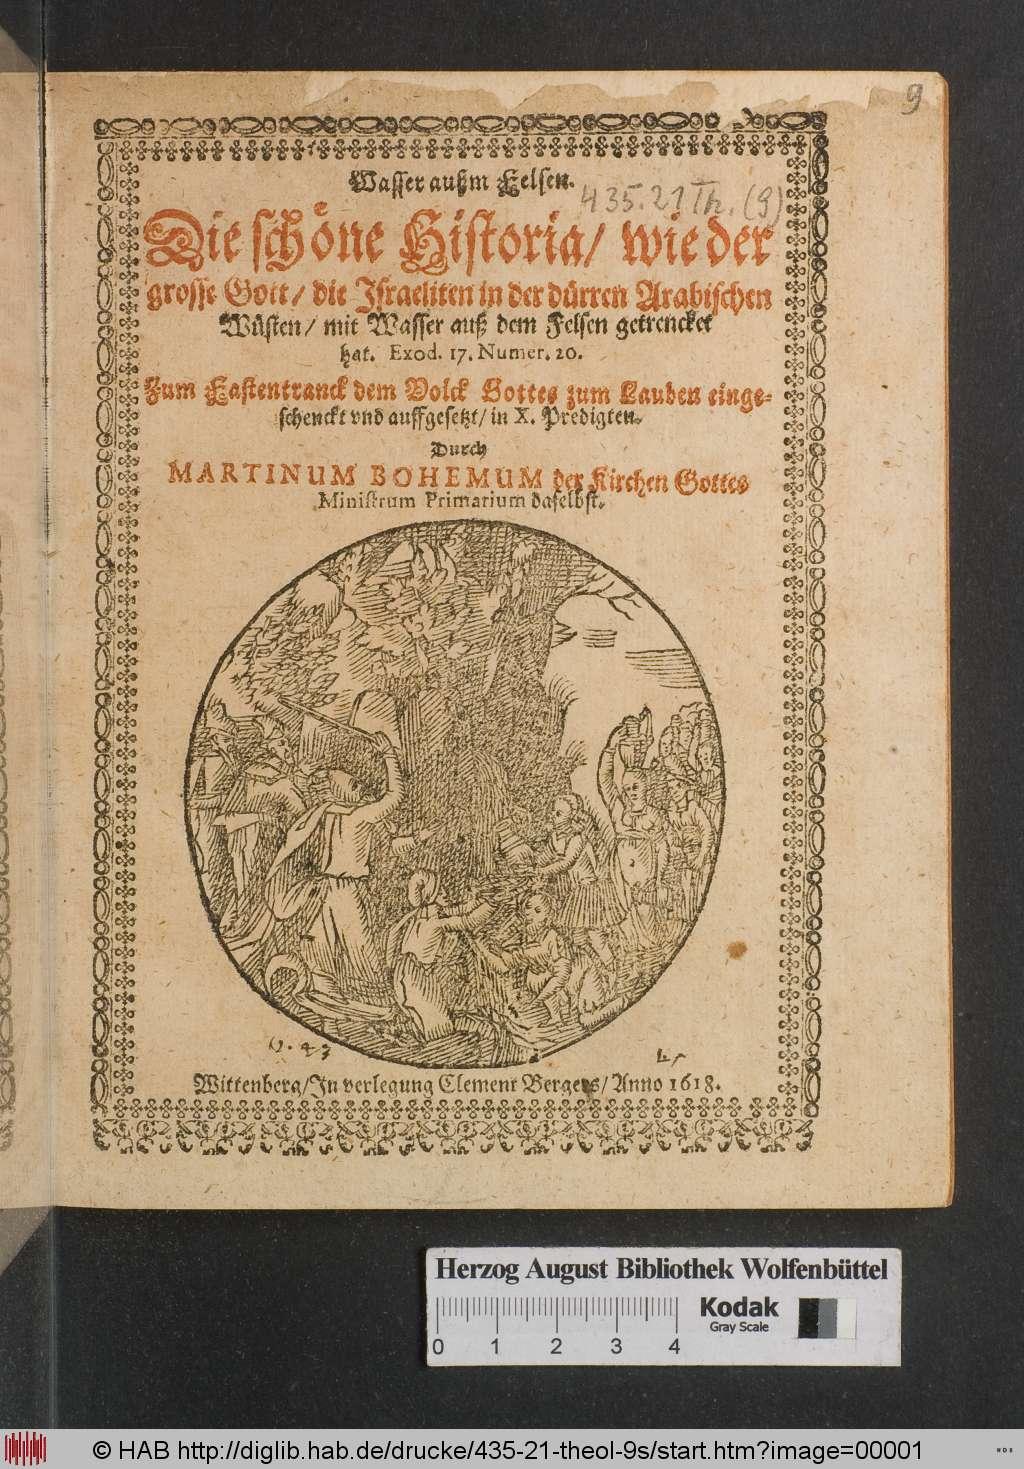 http://diglib.hab.de/drucke/435-21-theol-9s/00001.jpg